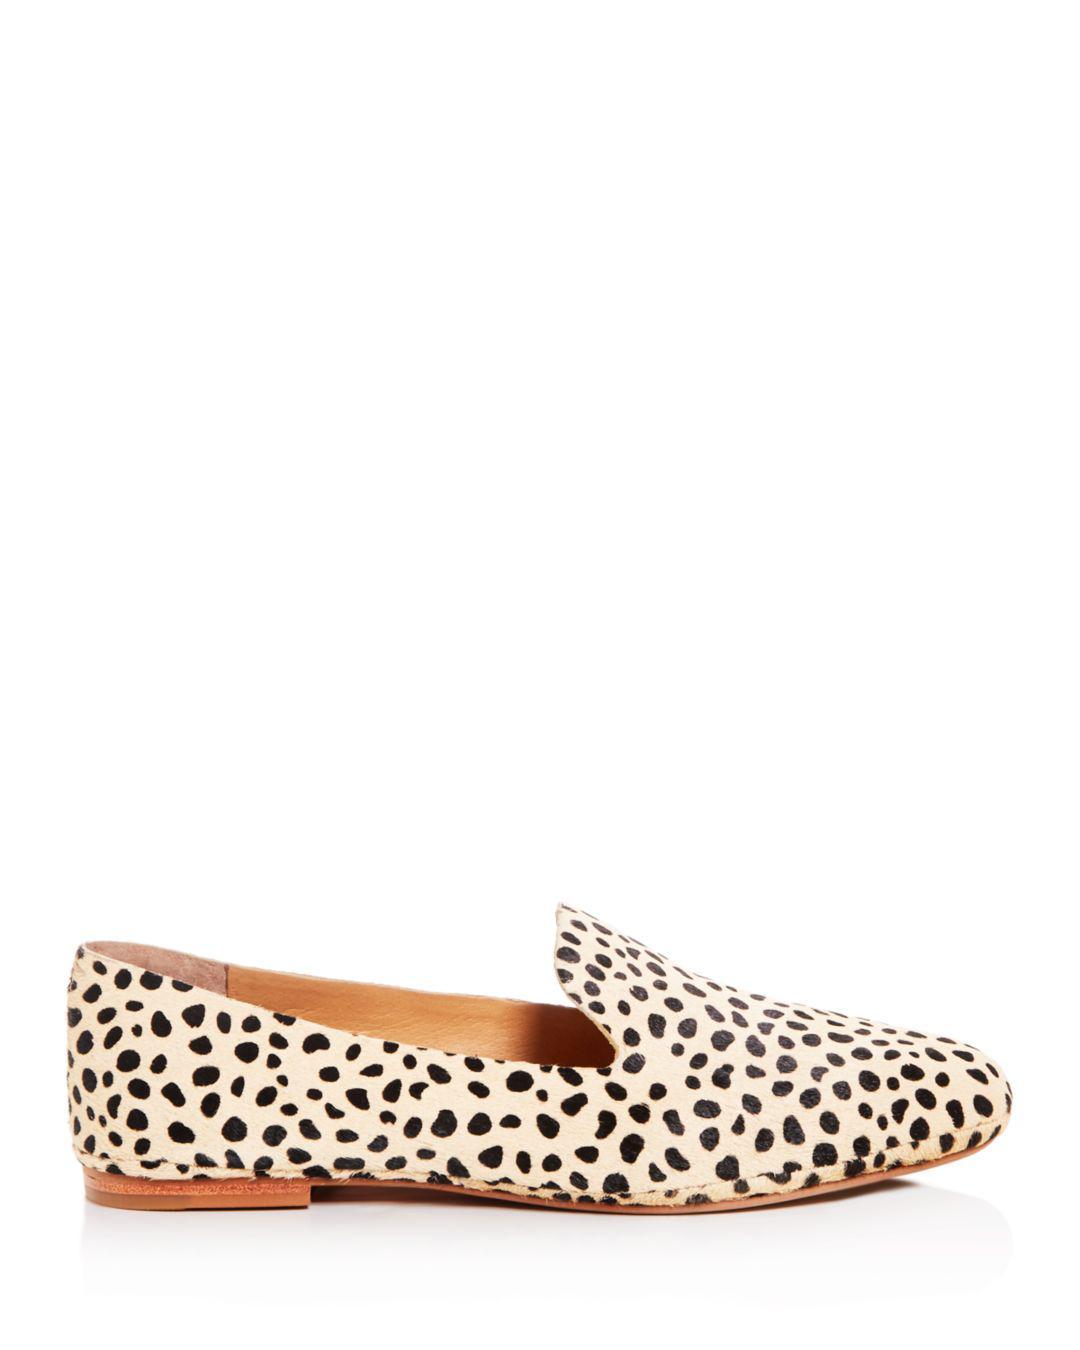 c6c73ef6c9f8 Lyst - Dolce Vita Women's Wynter Leopard Print Calf Hair Smoking Slippers  in Brown